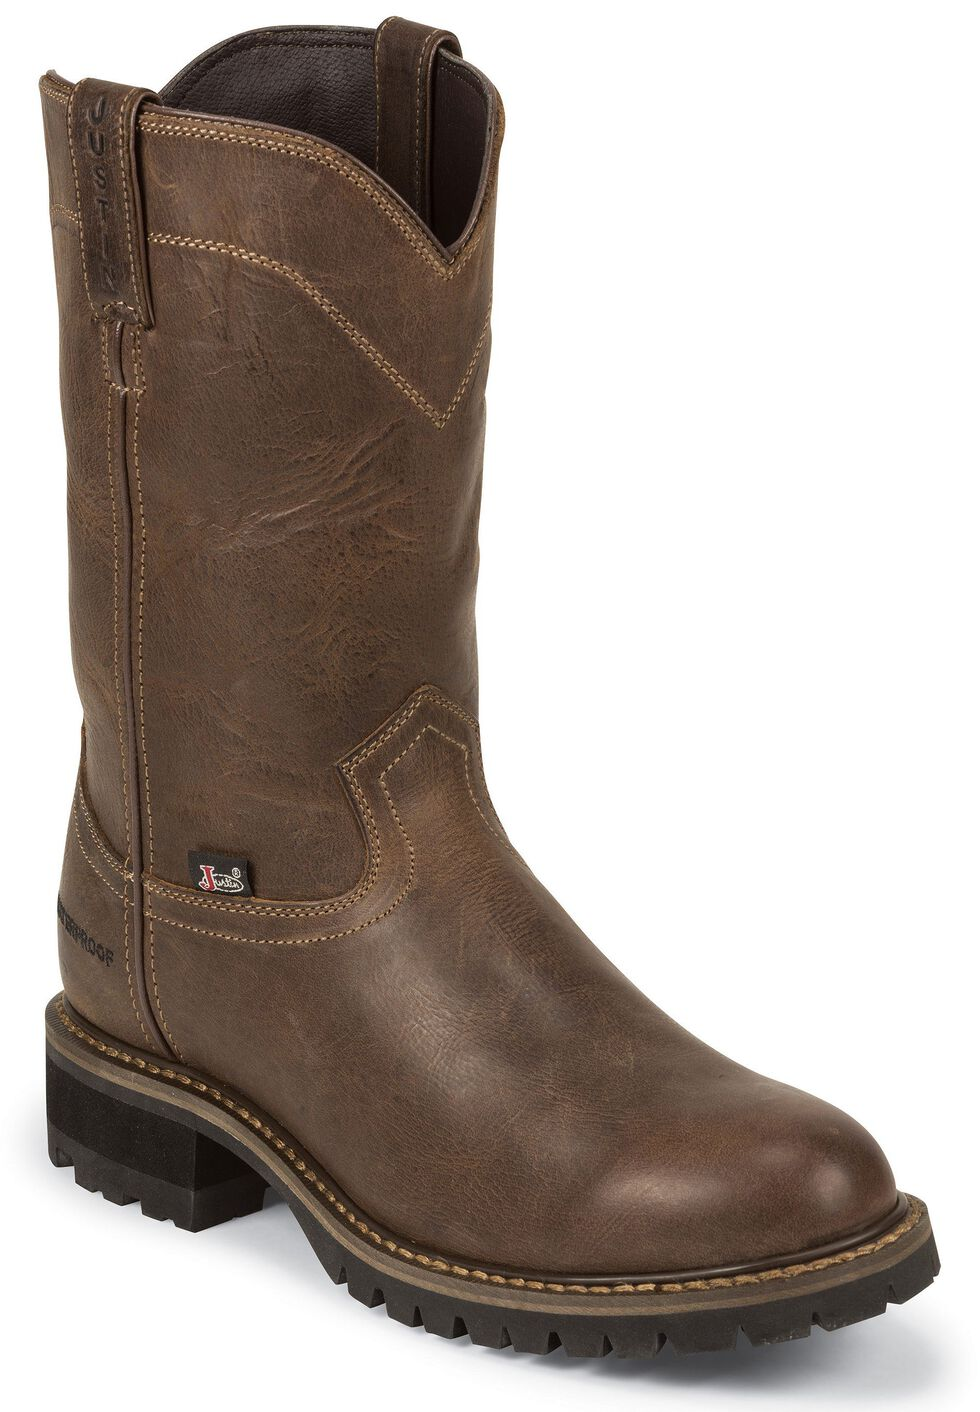 Justin Men's Abraham Waterproof Pull-On Work Boots - Soft Toe, Tan, hi-res